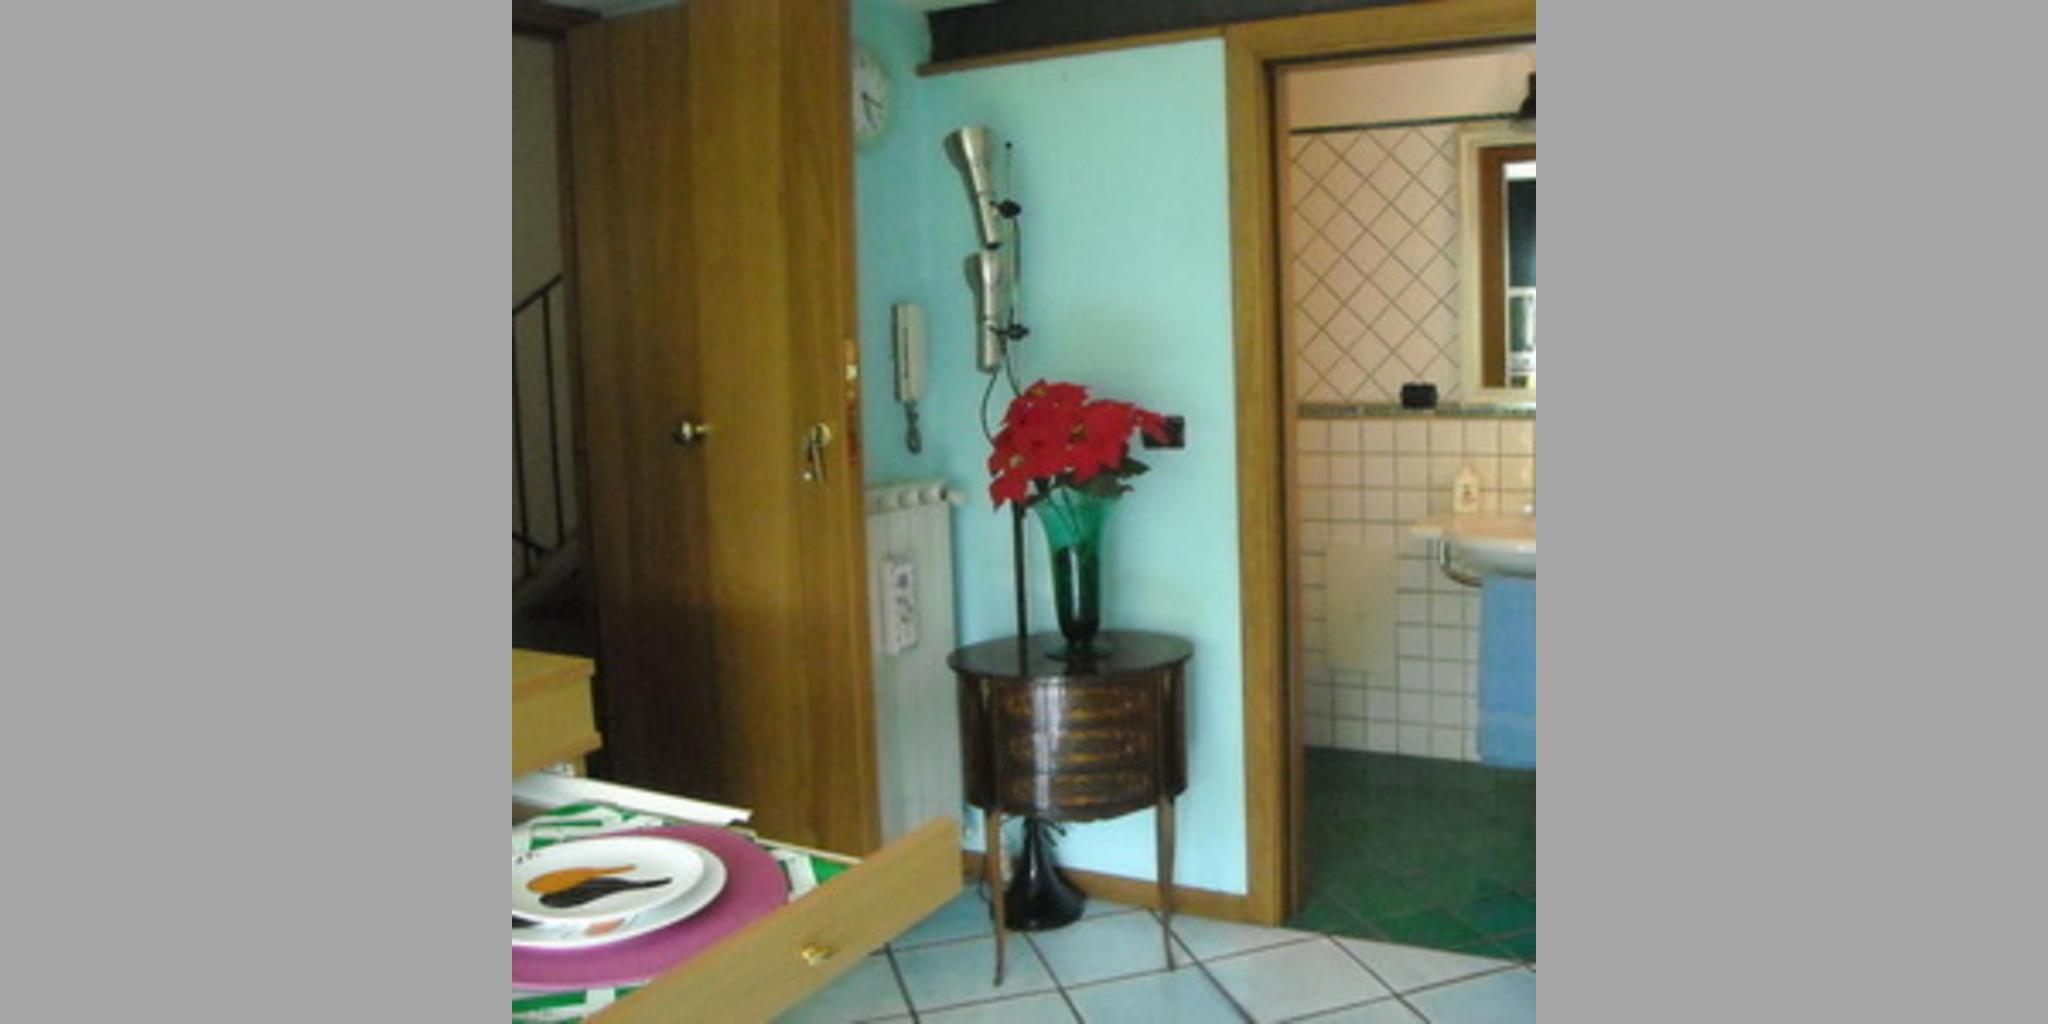 Bed & Breakfast Torre Annunziata - Oplonti 2